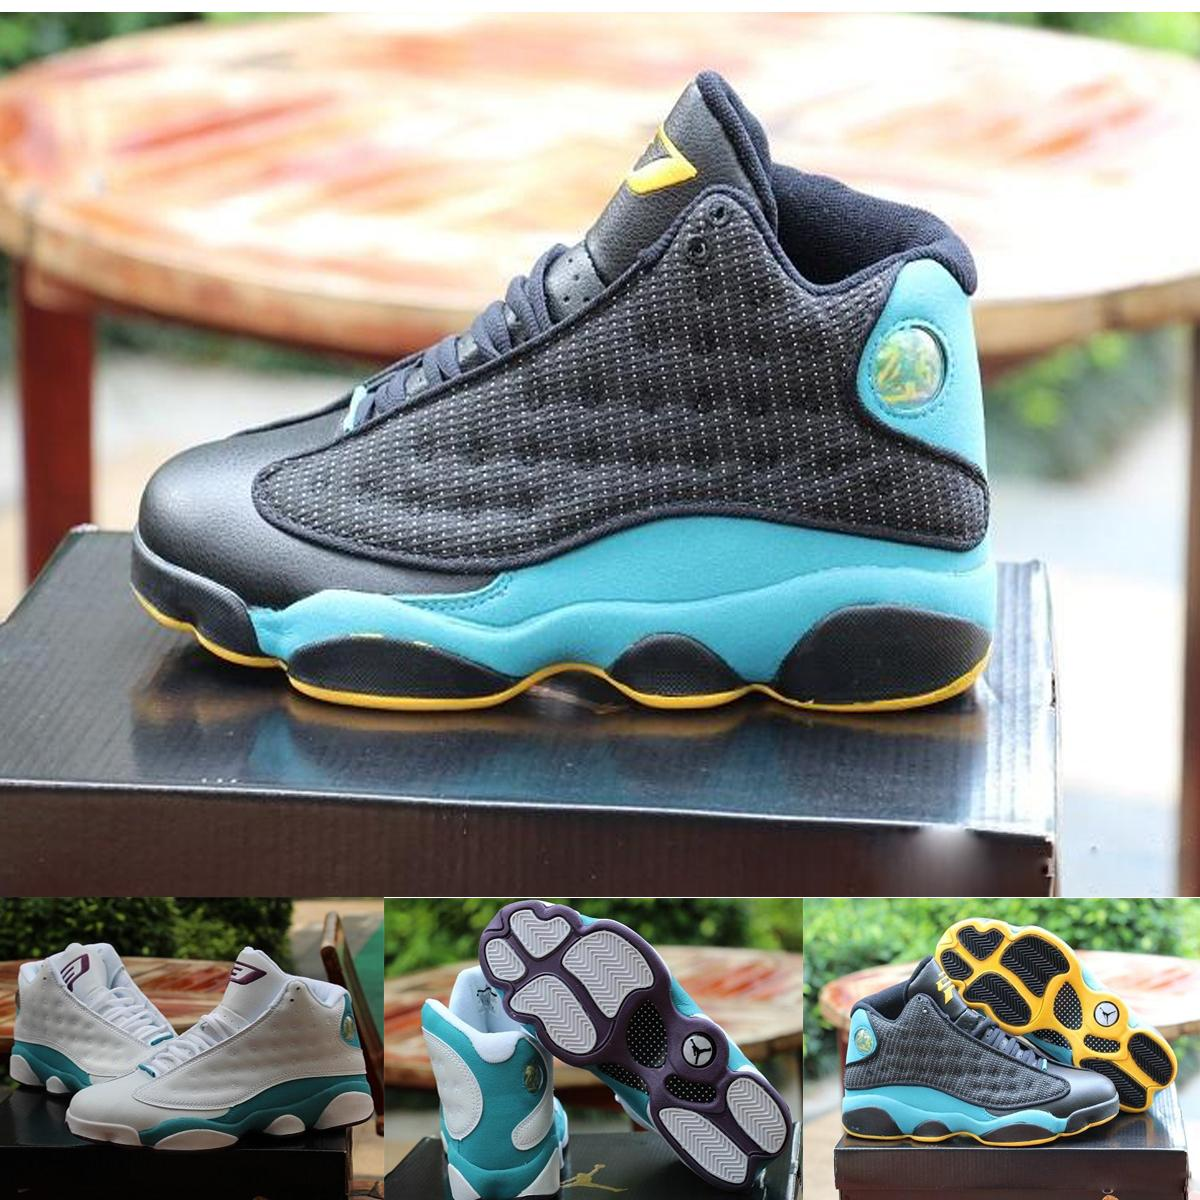 71e79b7eb8e9af Nike Air Jordan 13 Xiii Cp3 Chris Paul Sunstone Men Basketball Shoes Black  Green Yellow 823902 015 Man Sneakers Size 8 13 Cheap Shoes 4e Basketball  Shoes ...